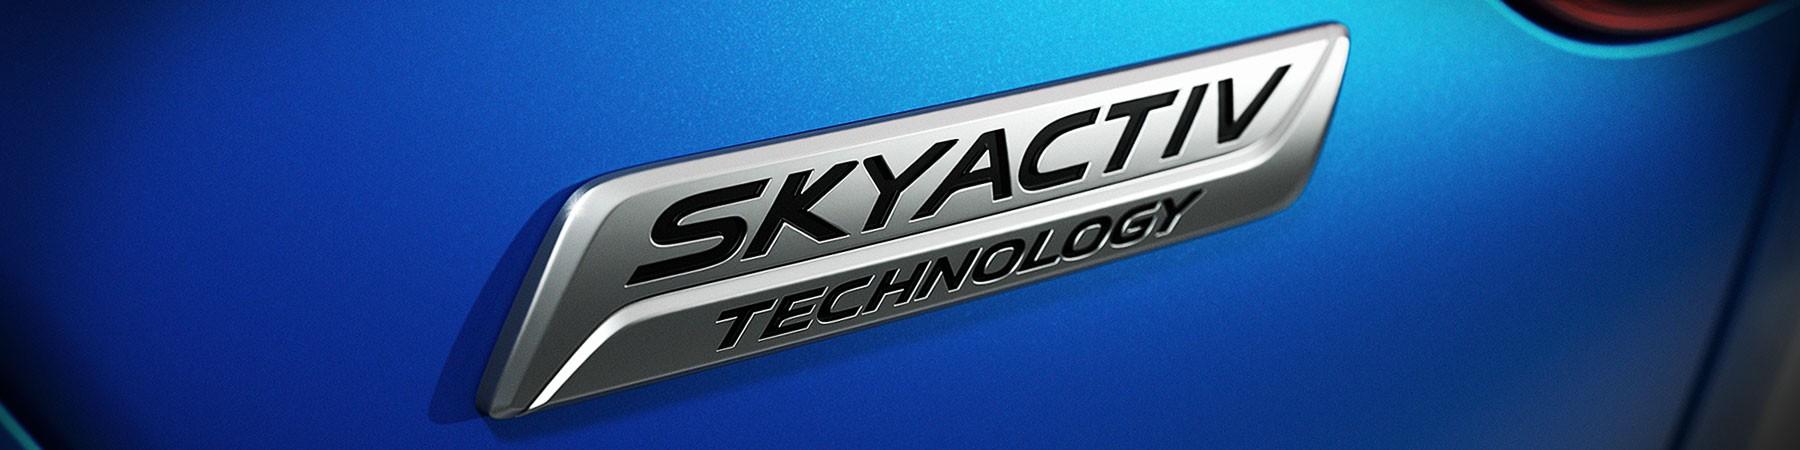 Mazda Skyactiv Logo PNG-PlusPNG.com-1800 - Mazda Skyactiv Logo PNG